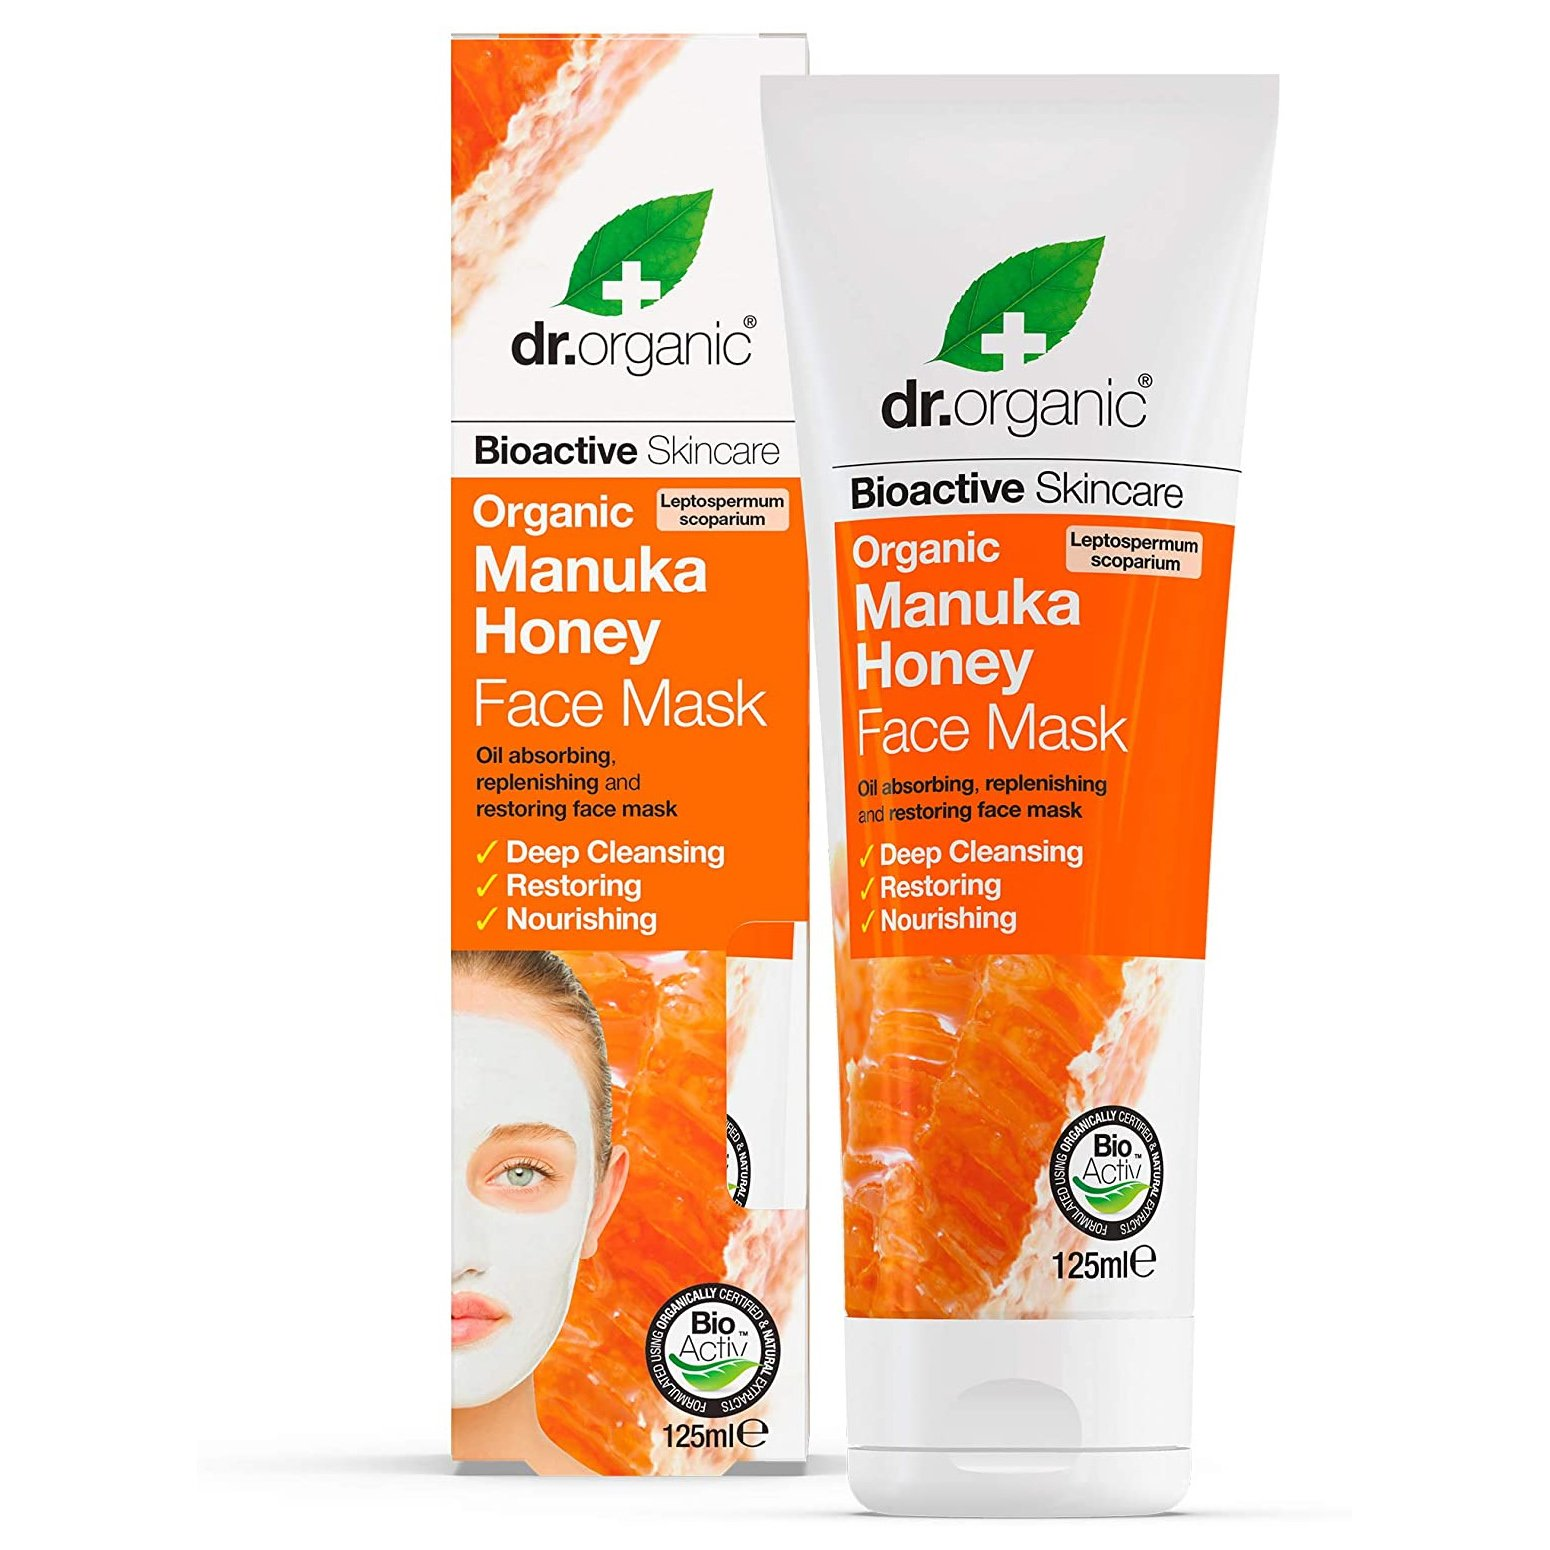 Dr.Organic Manuka Honey Face Mask Μάσκα Προσώπου με Βιολογικό Μέλι Μανούκα για Βαθύ Καθαρισμό & Θρέψη 125ml